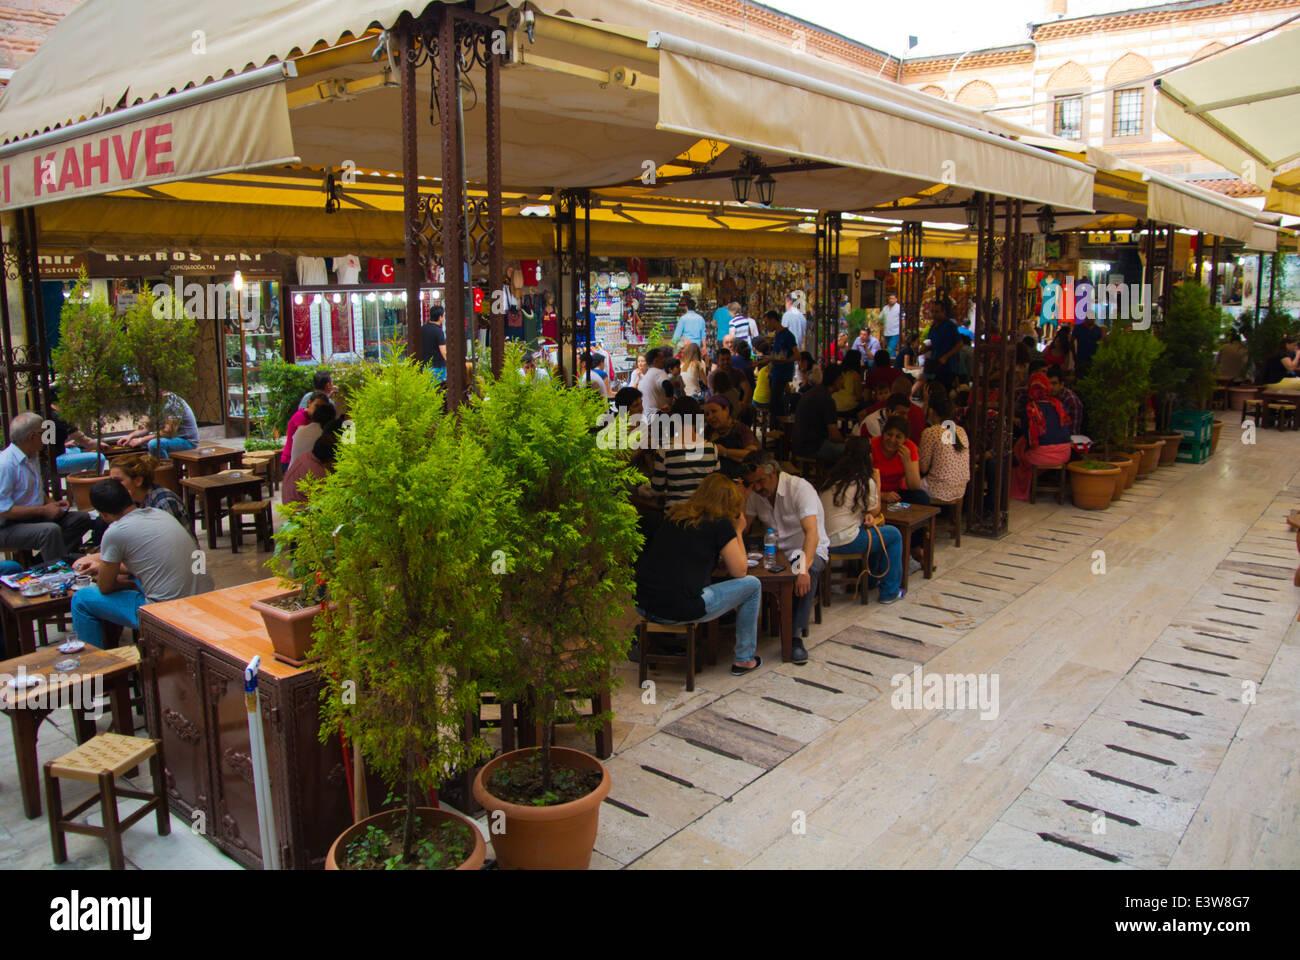 Tea room terraces, Kemeralti bazaar district, central, Izmir, Turkey, Asia Minor - Stock Image